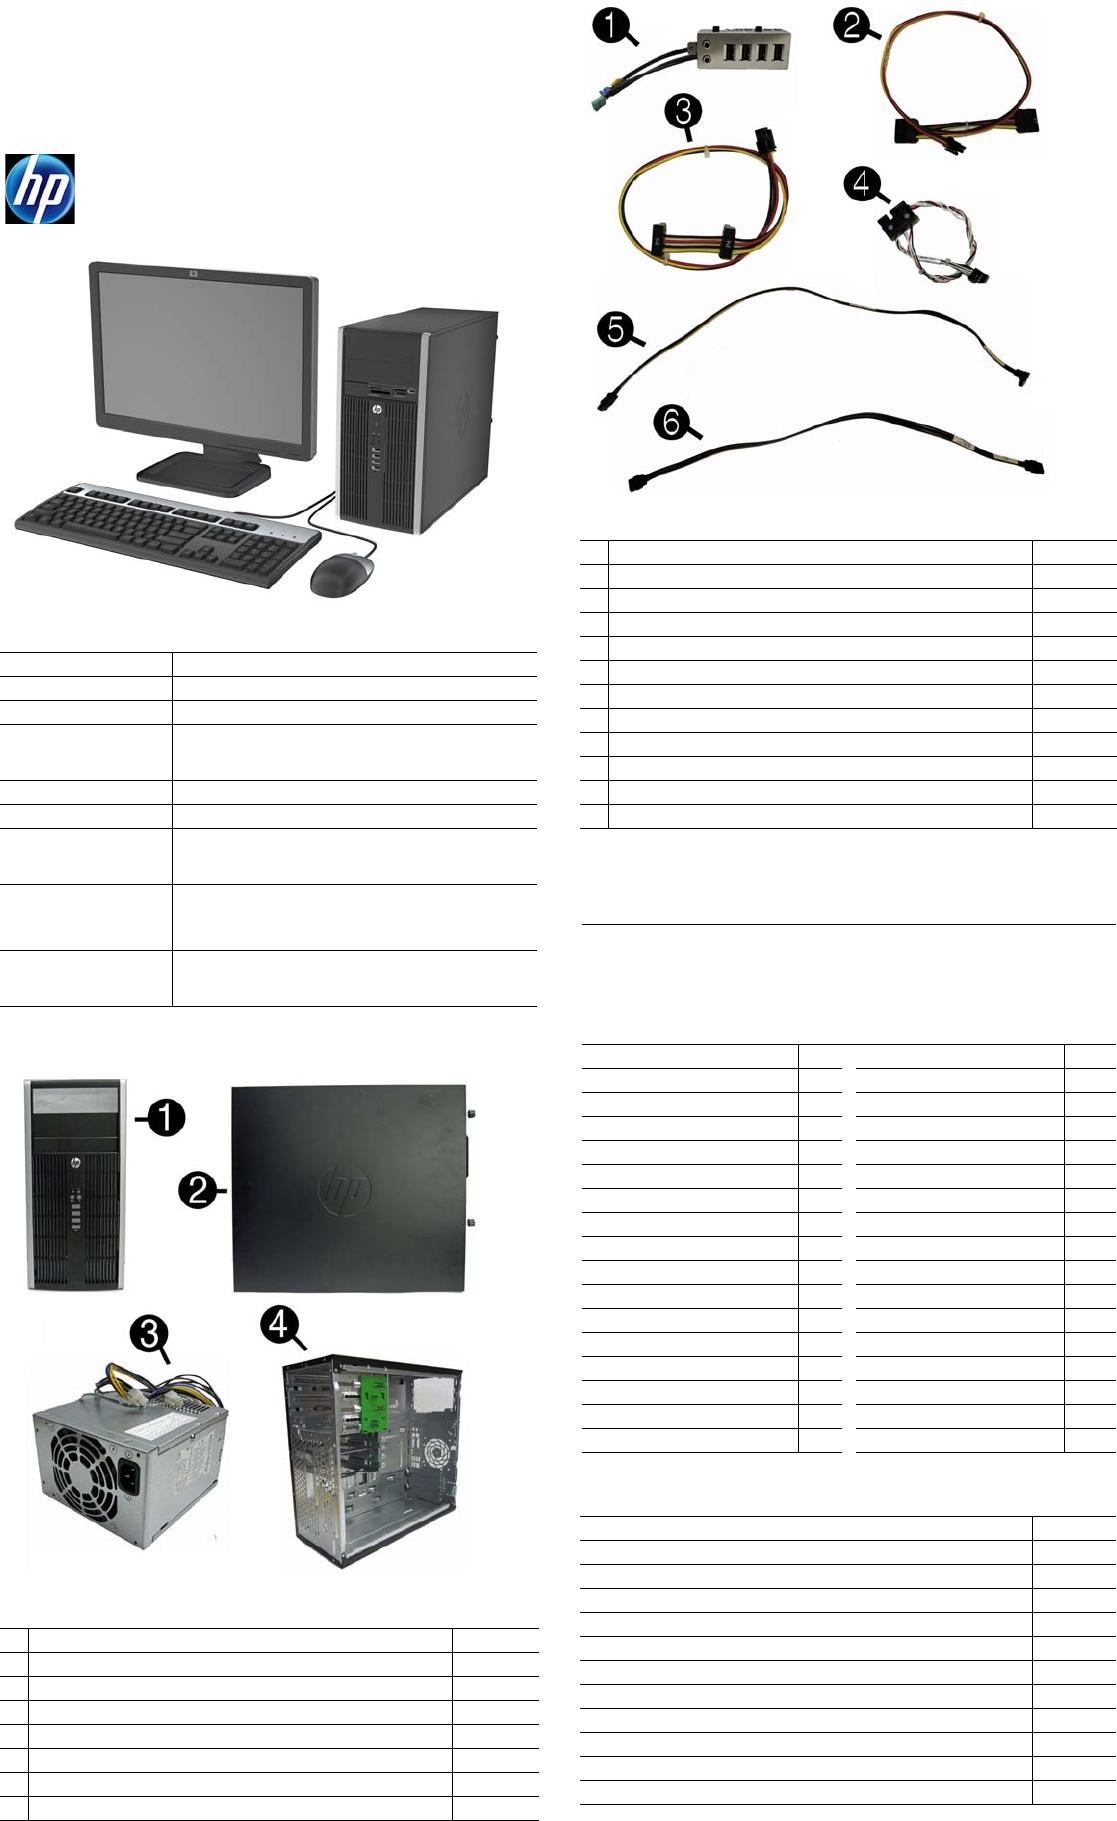 HP COMPAQ ELITE 8300 MICROTOWER PC DRIVERS (2019)